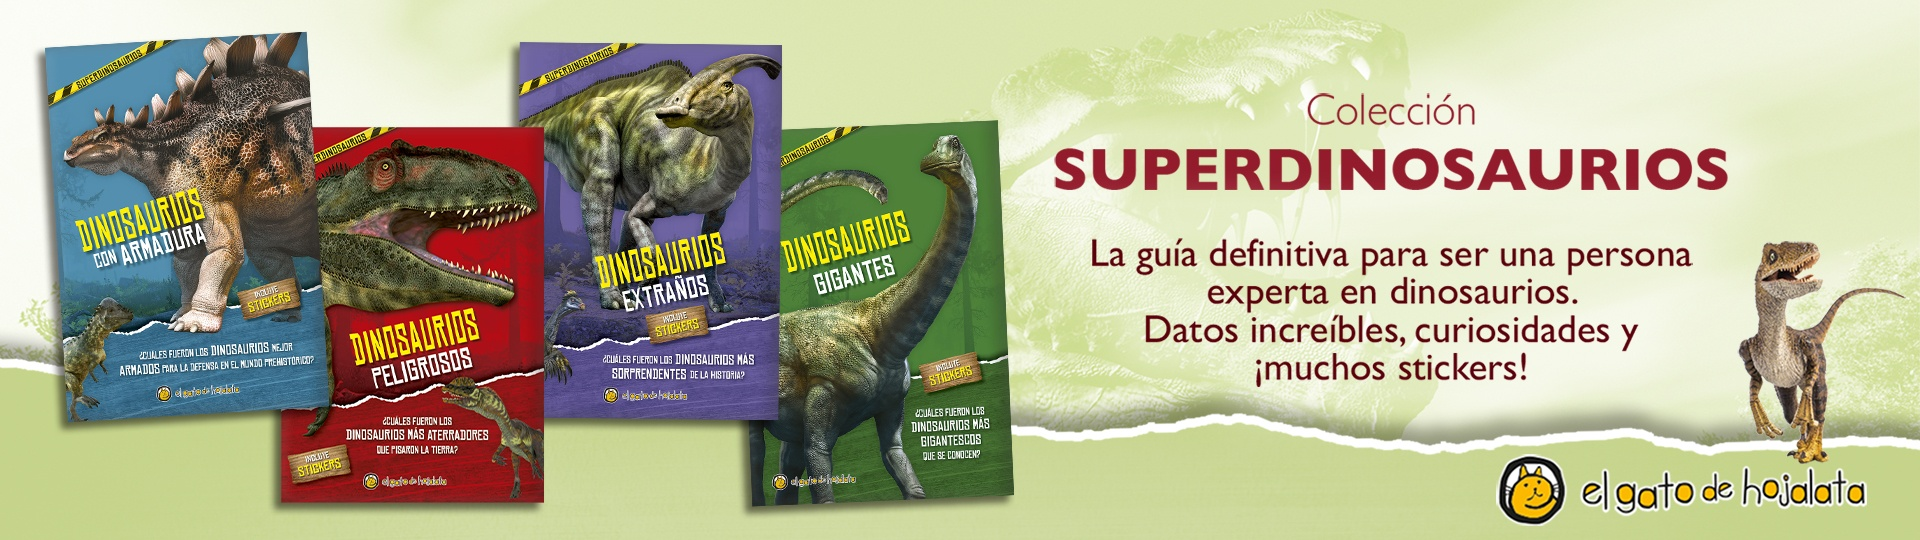 SUPERDINOSAURIOS_WEB_1920X540